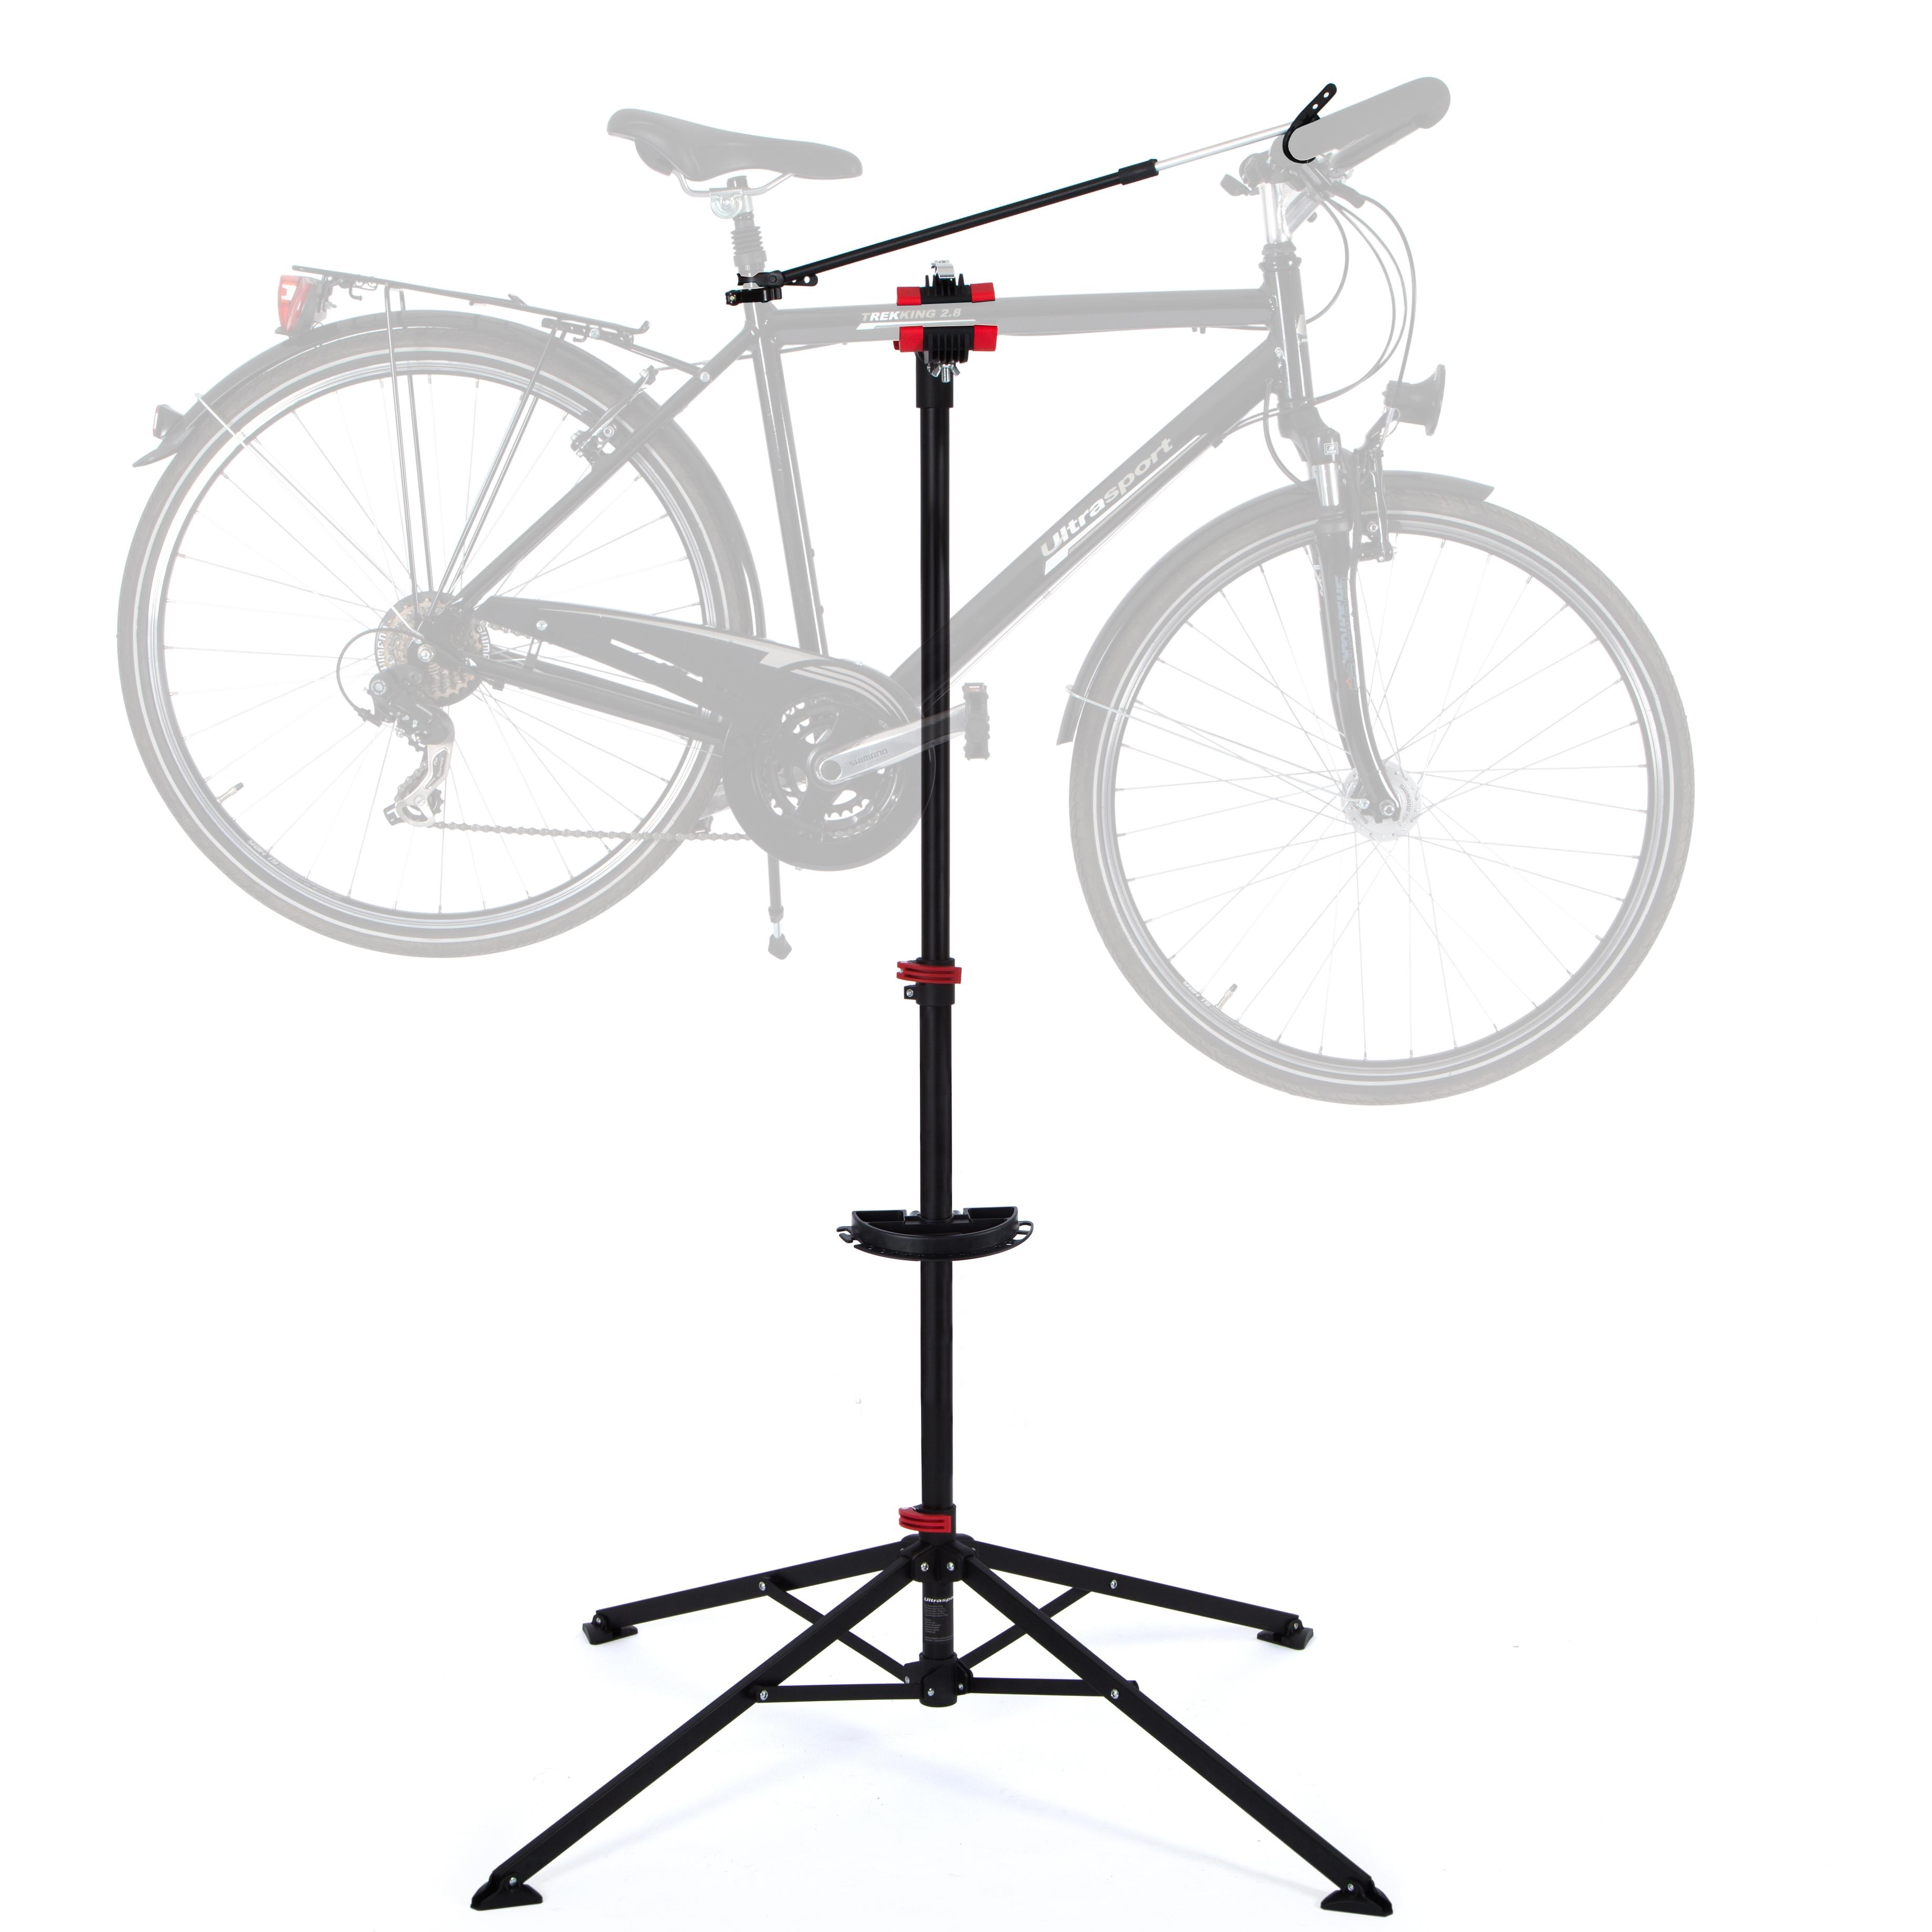 Ultrasport Caballete para bicicleta Expert, robusto caballete para ...